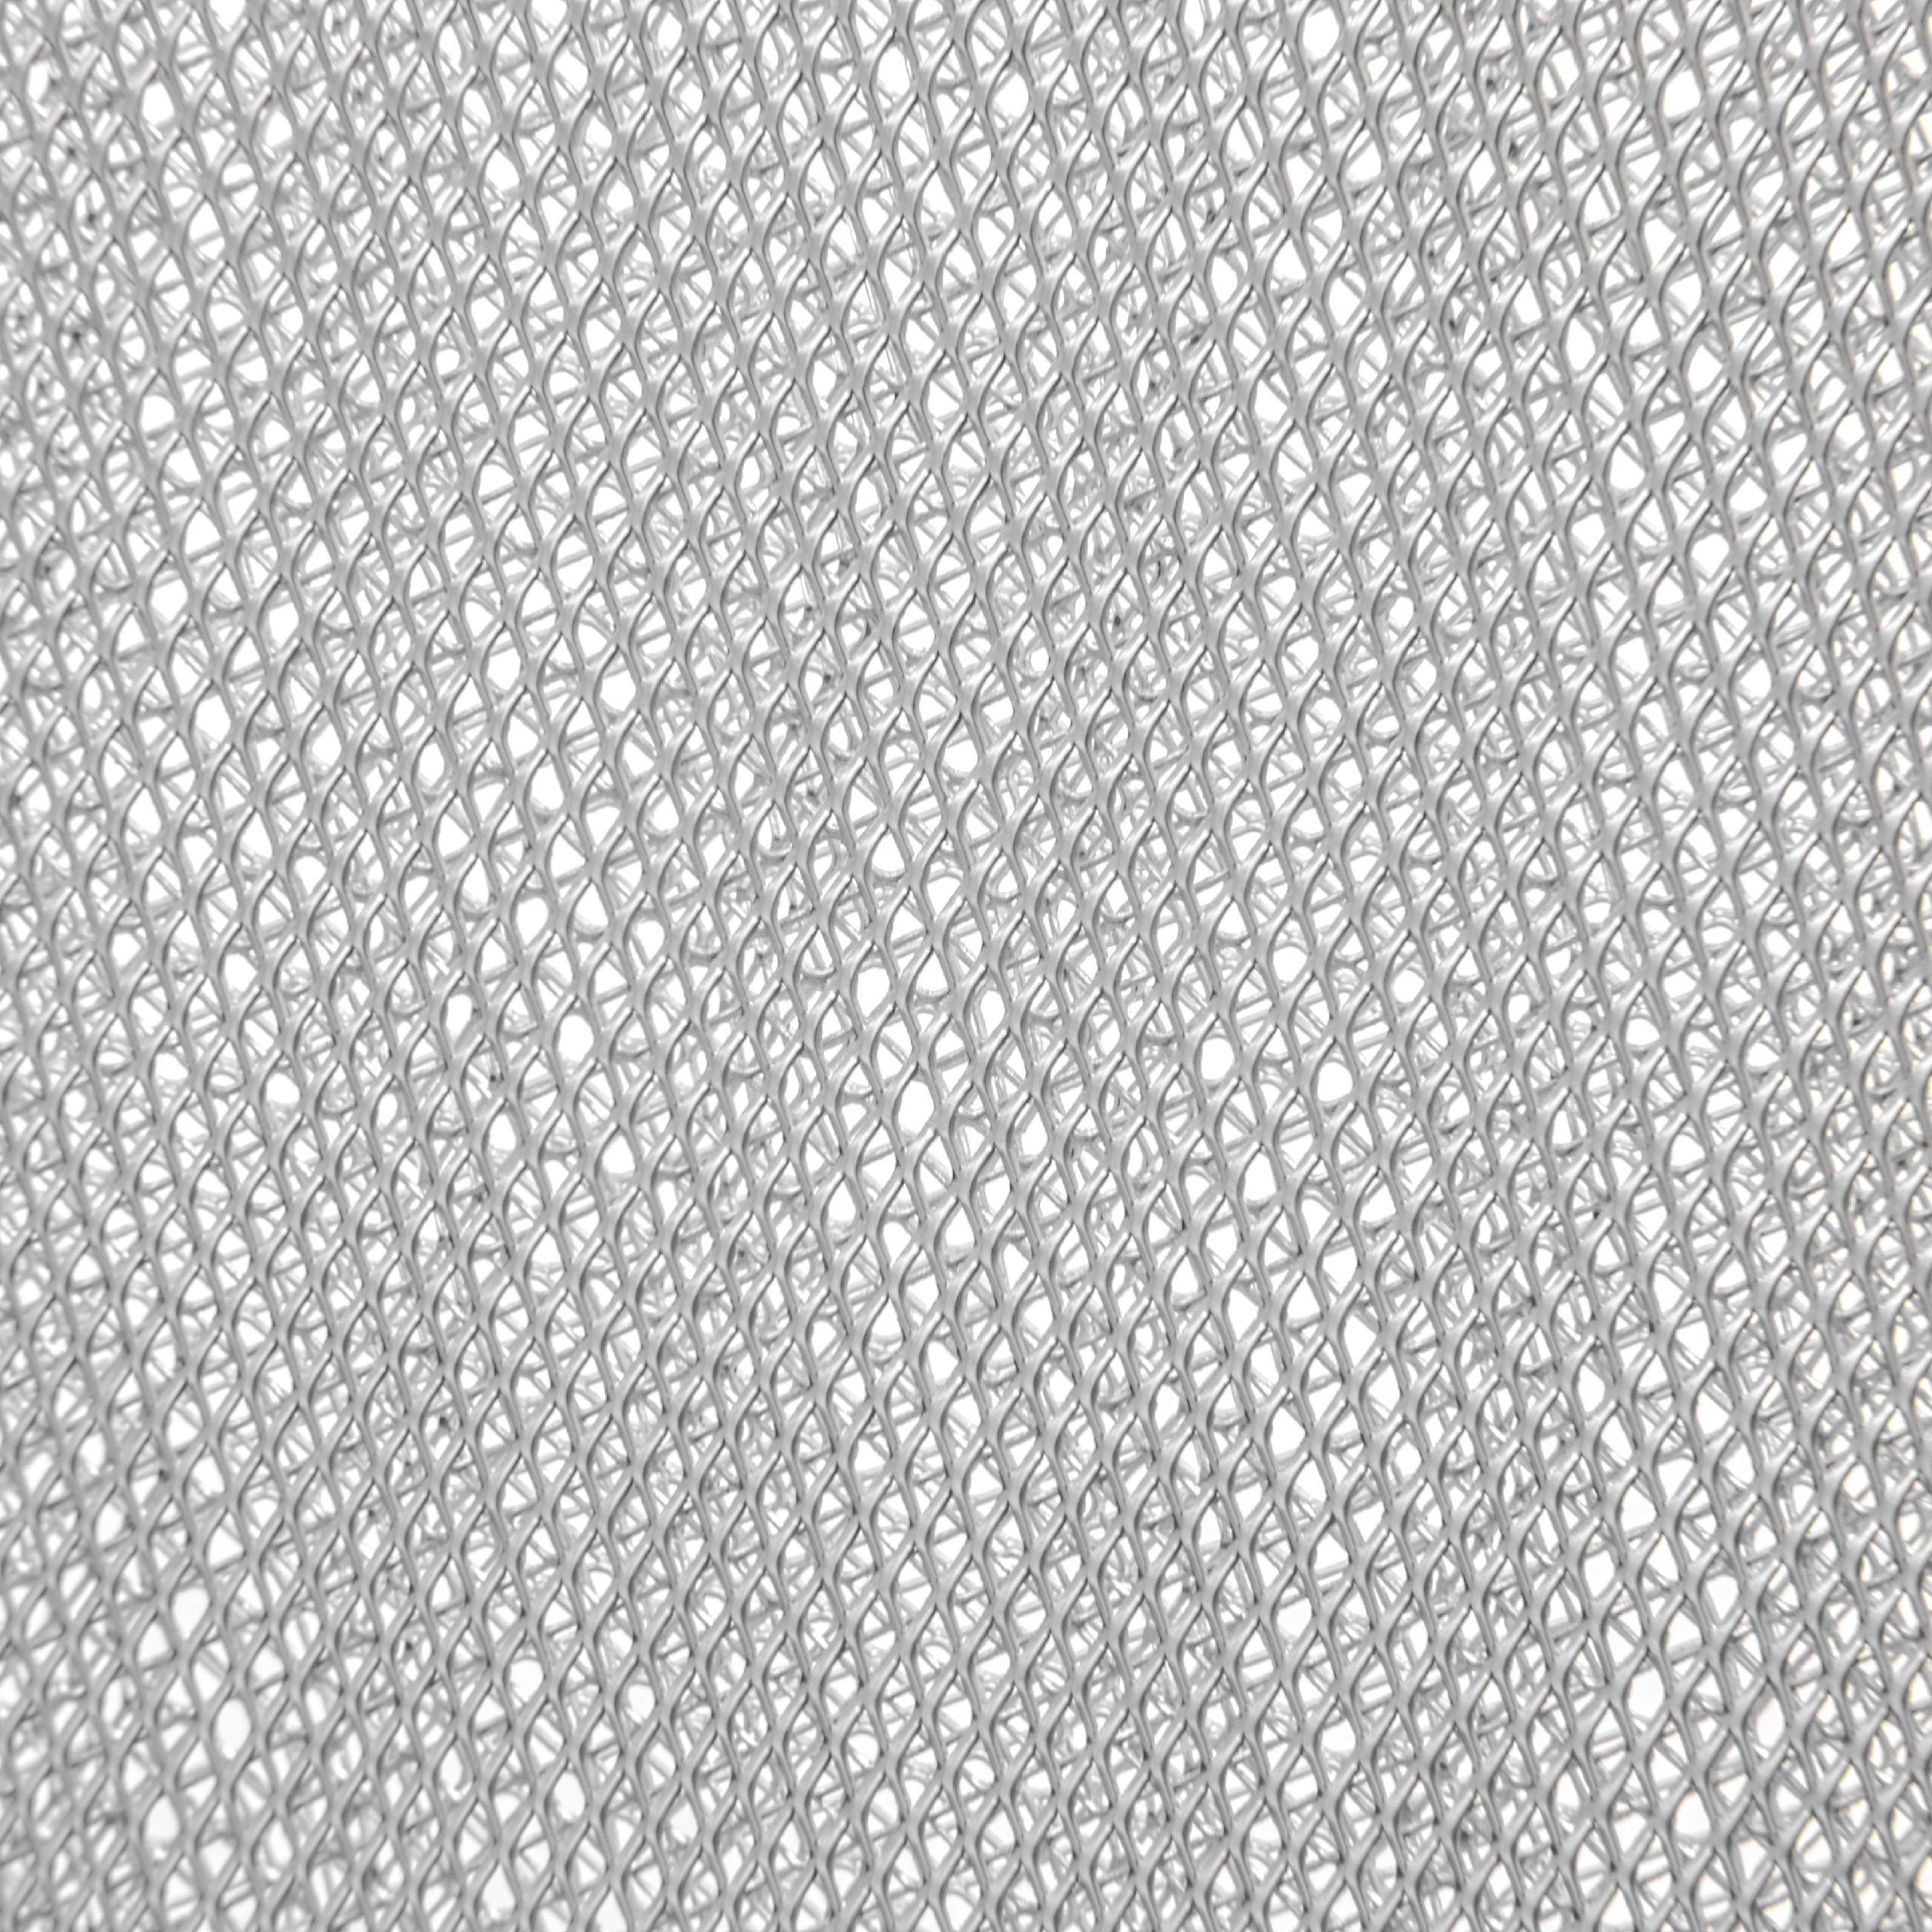 Metallfettfilter Dunstabzugshaube Universal 2021